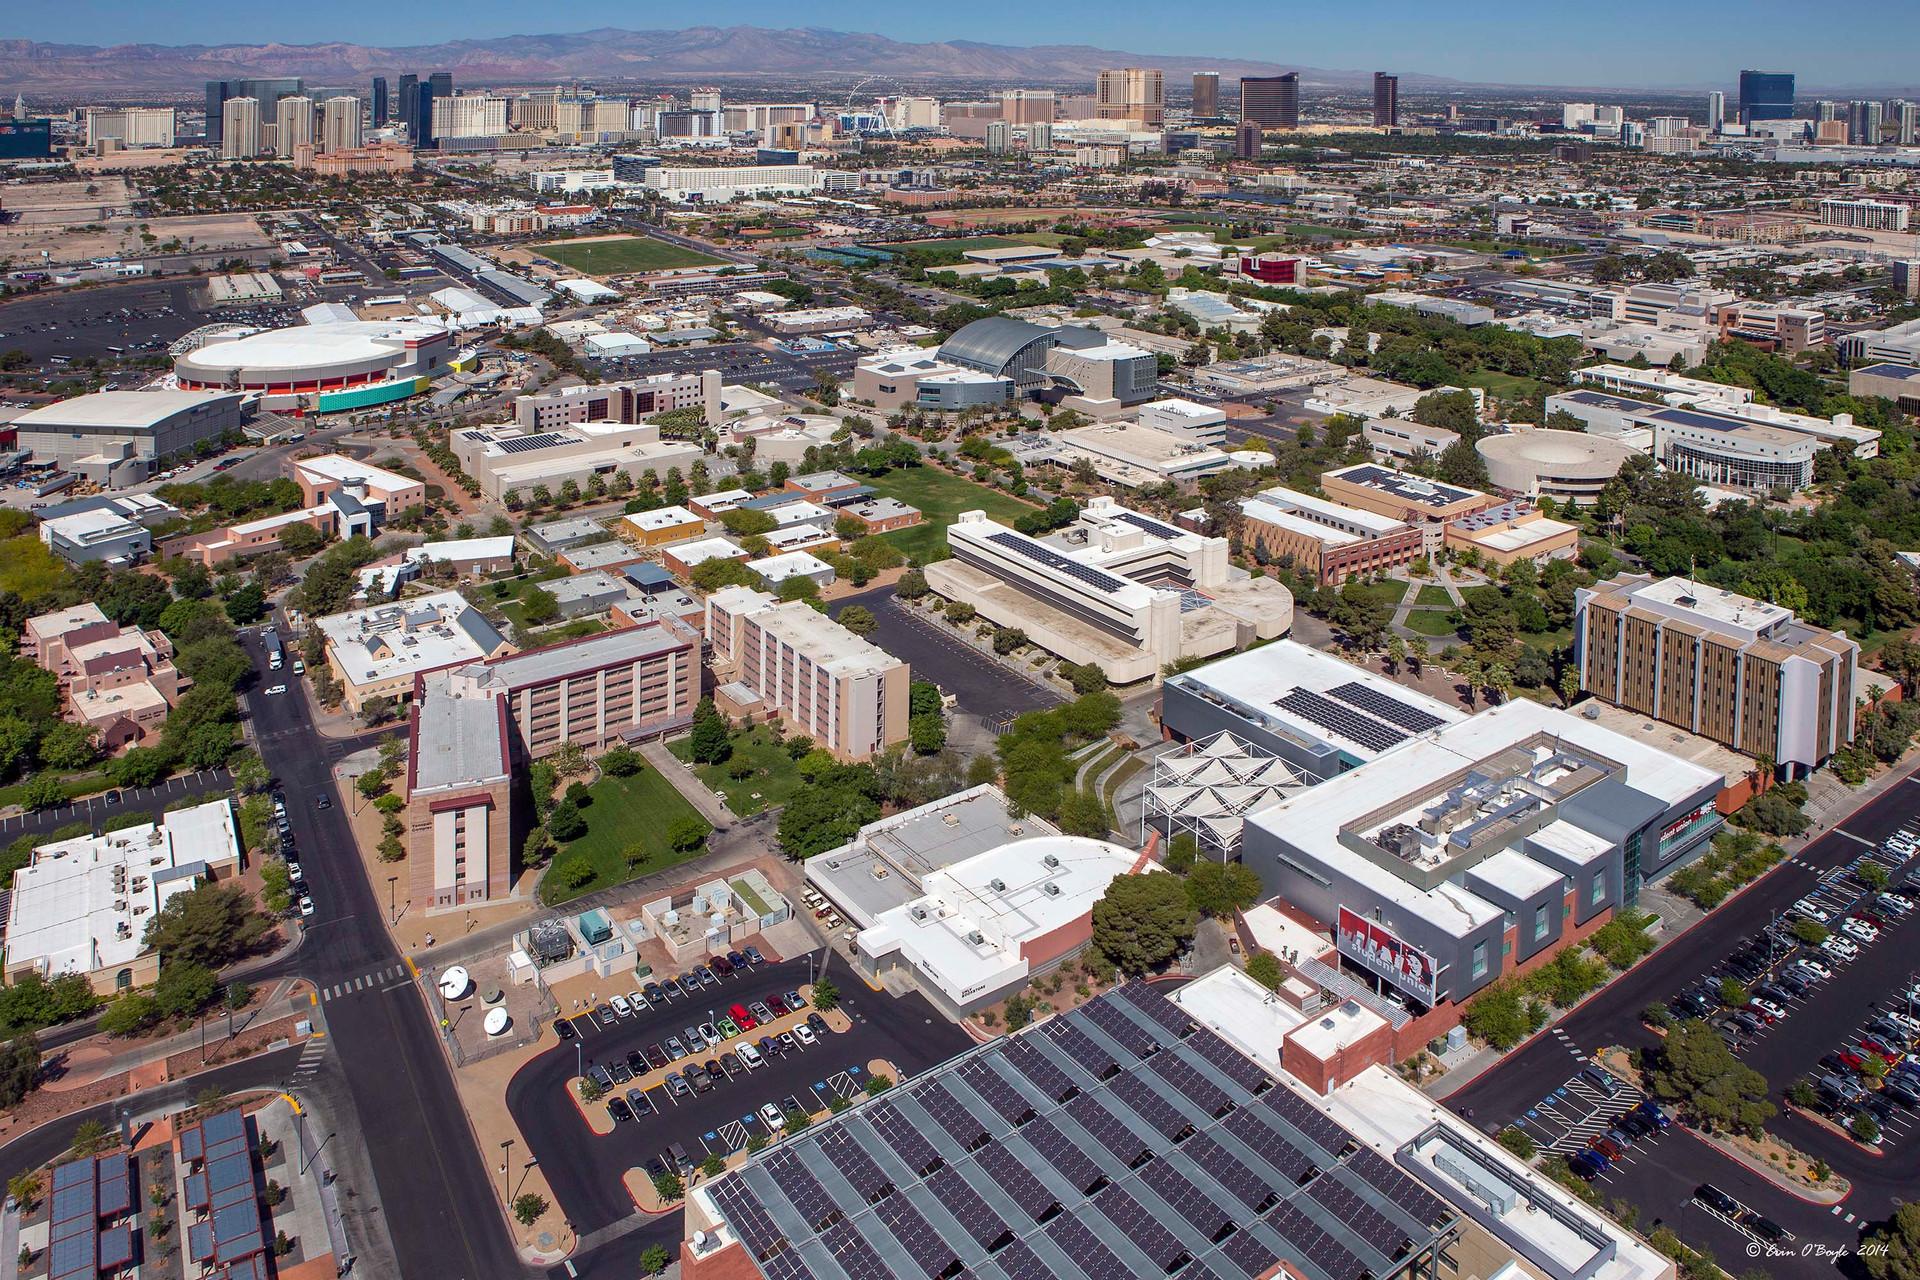 UNLV, Las Vegas Campus